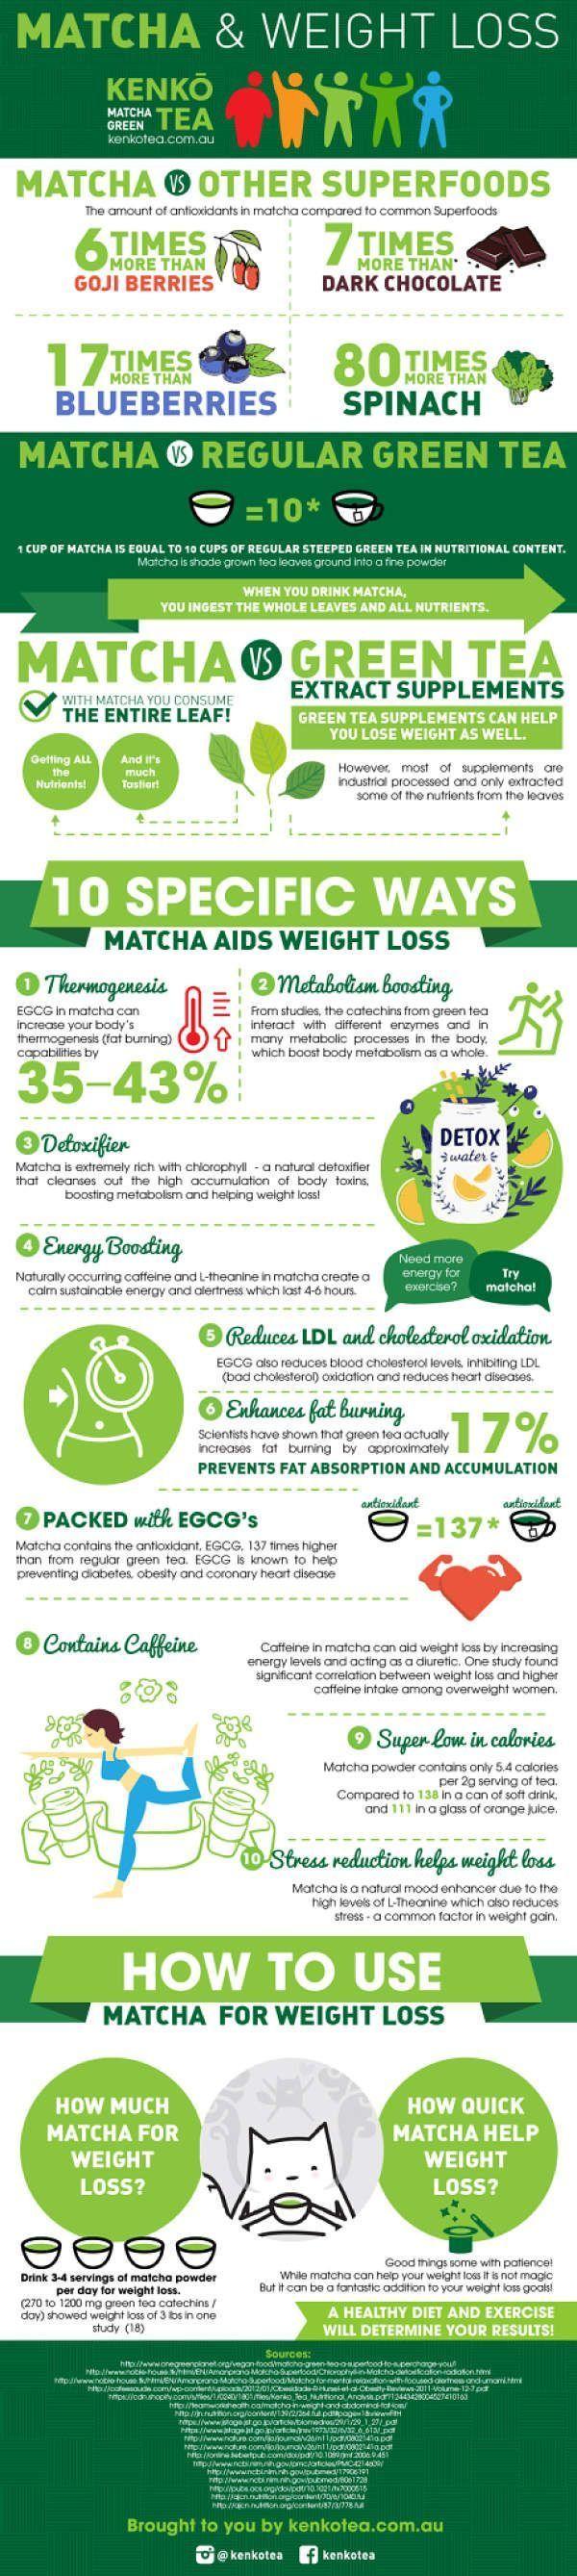 Matcha Green Tea health Benefits Infographic. Try Mango Lime Matcha Sparkling Tea from Bhakti to get your match a fix   drinkbhakti.com #nutritionfactslosingweight